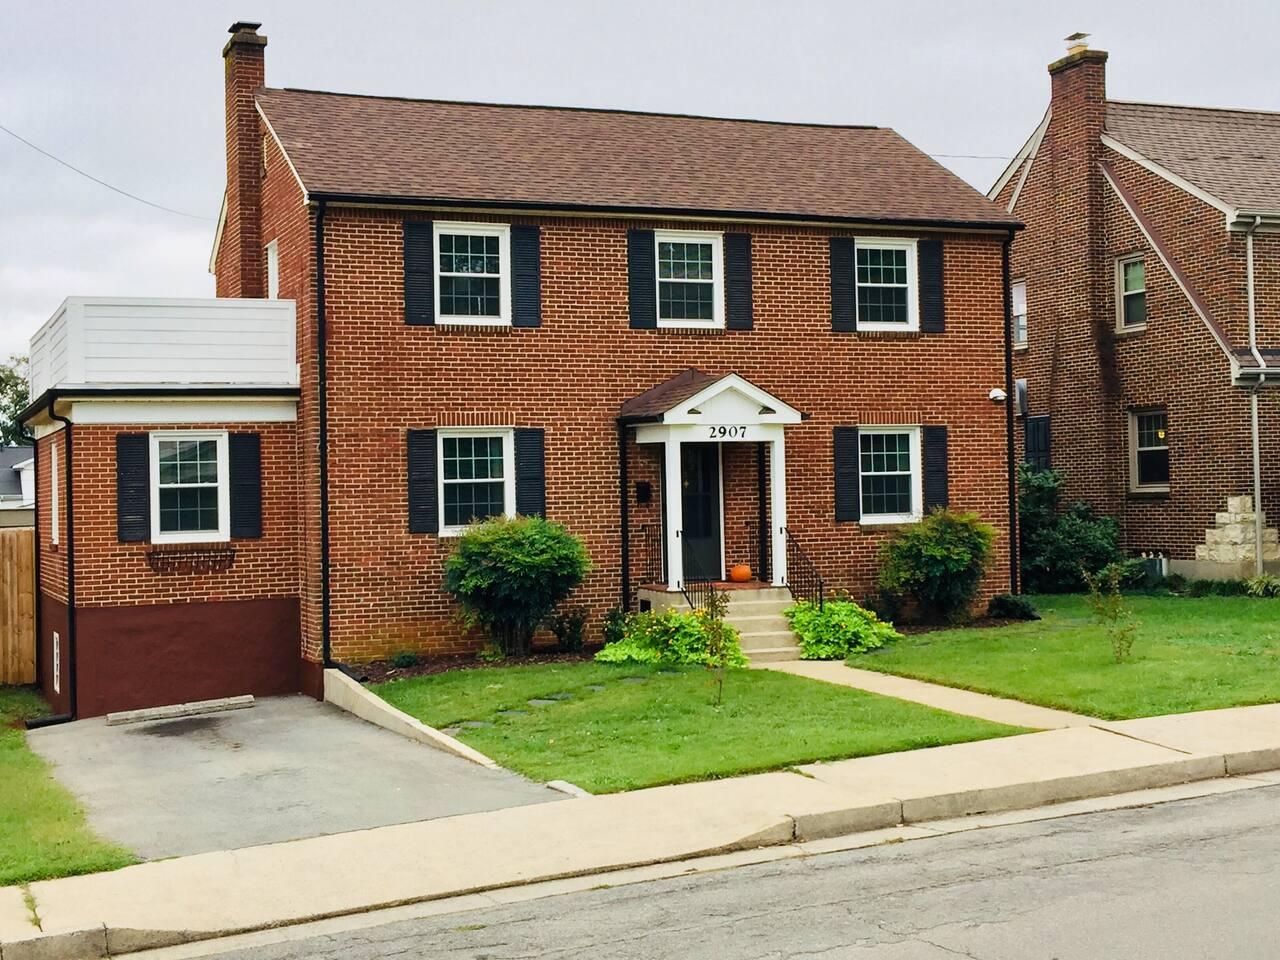 Ms Helen\'s on Huntington Feels like Home GreatBeds - Houses for Rent ...